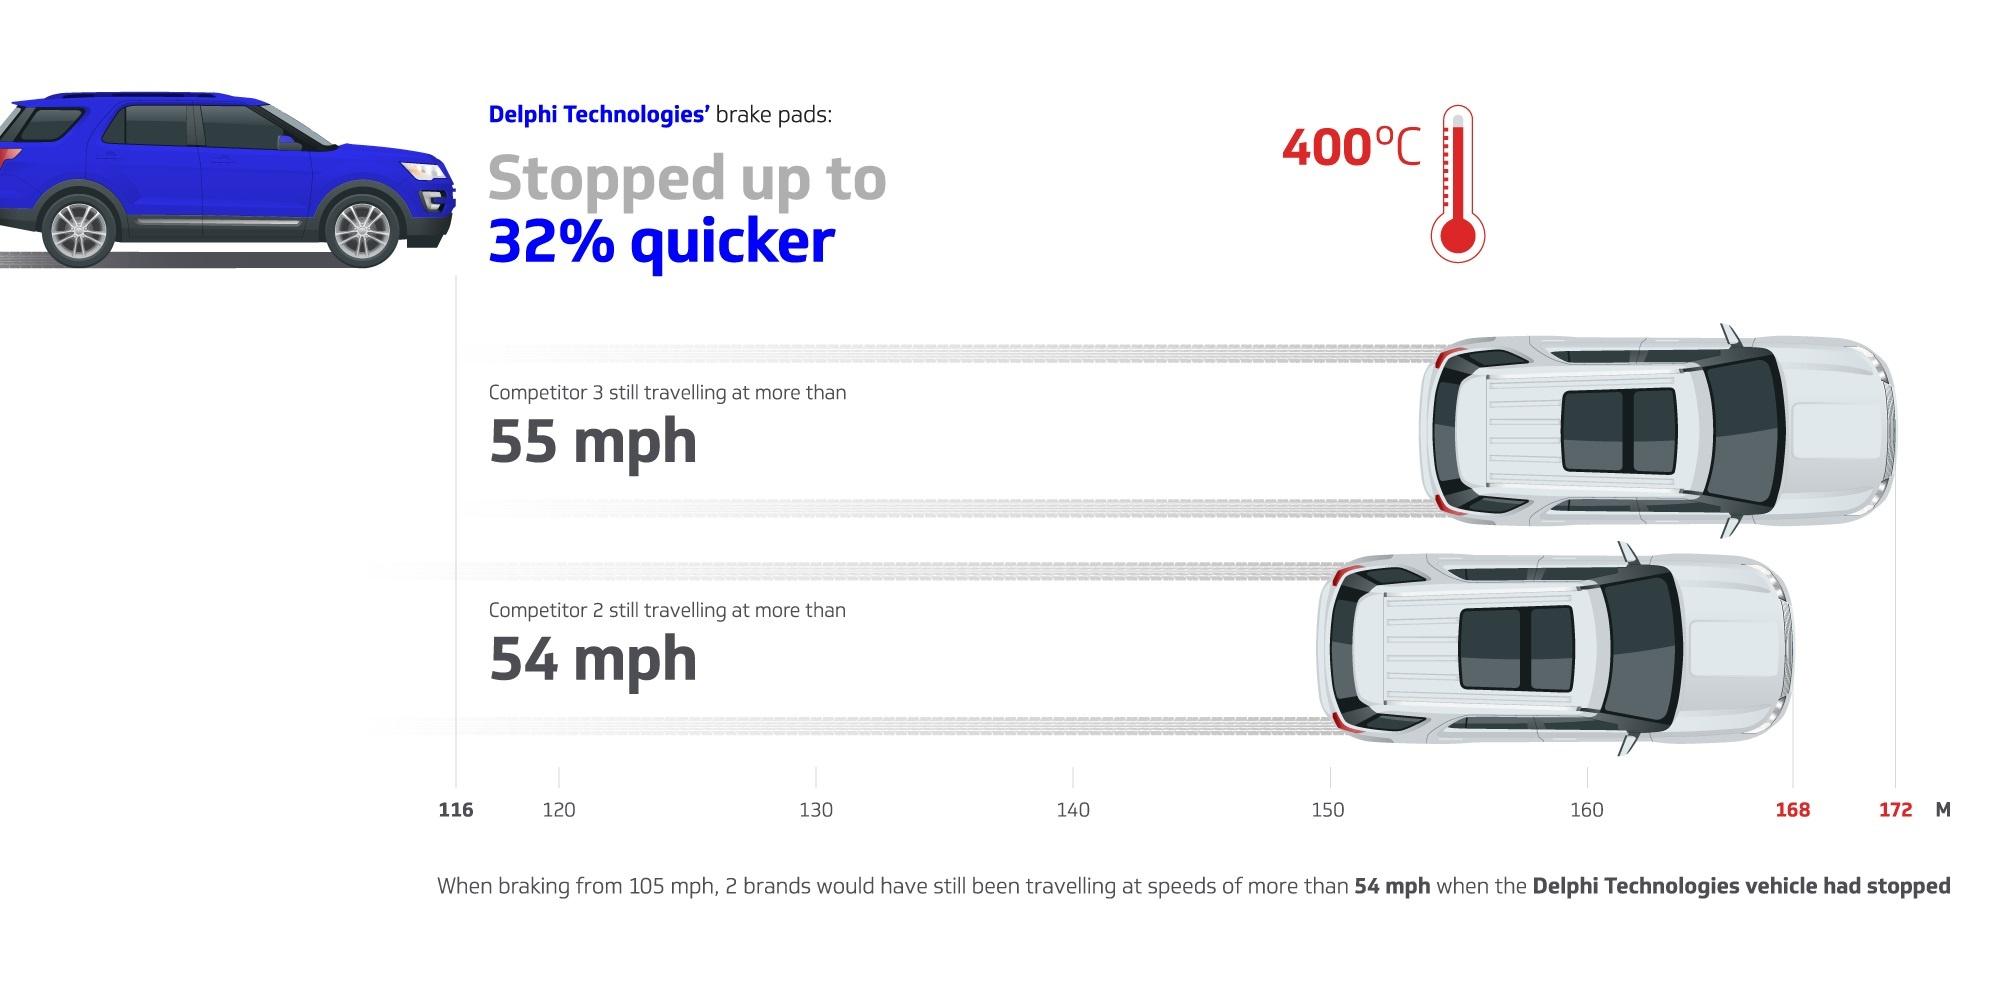 Delphi Technologies' brake pads excel in highperformance vehicle testing